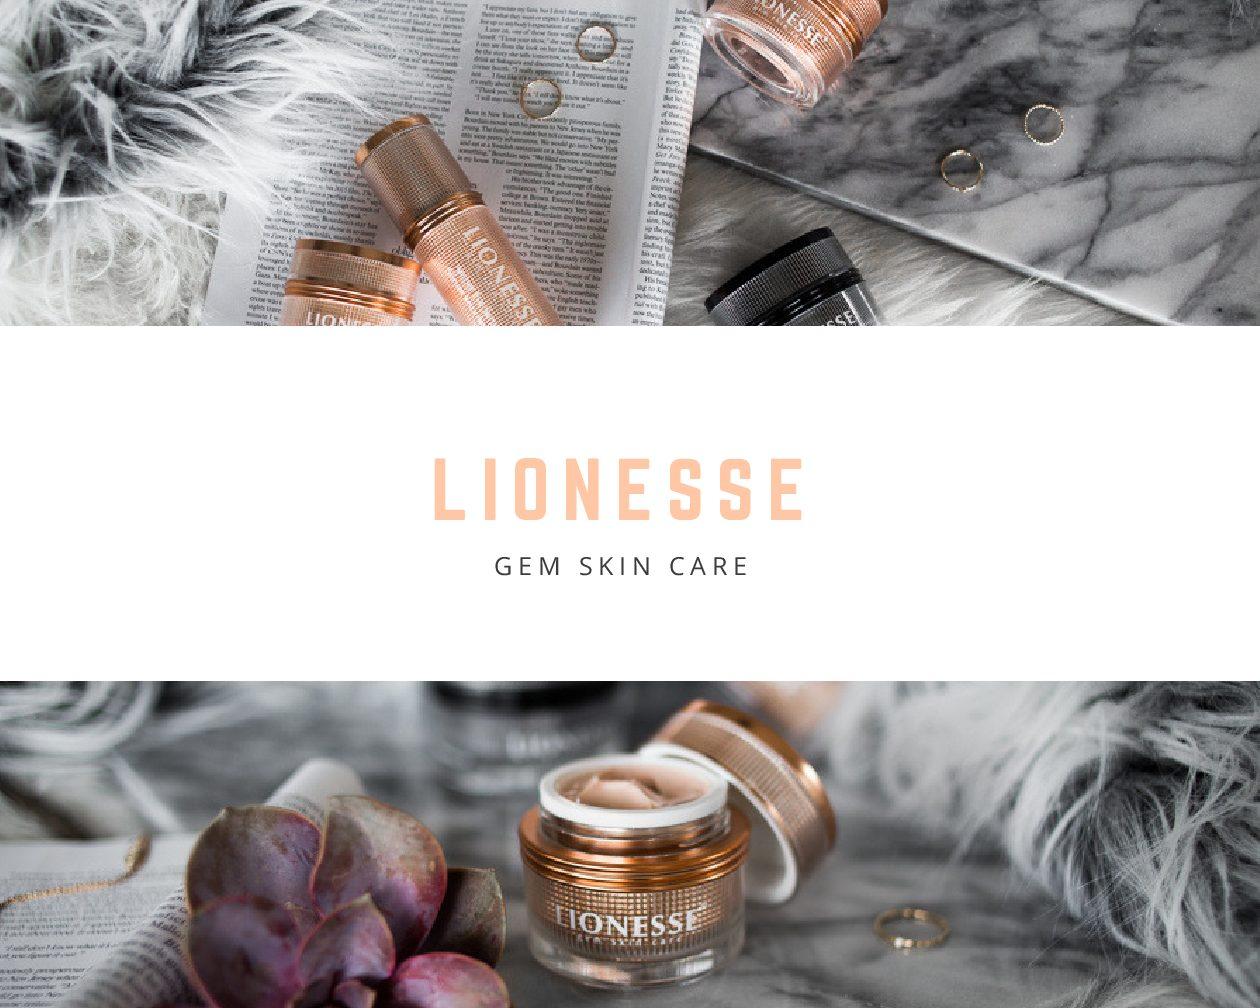 Lionesse Gem Skin Care